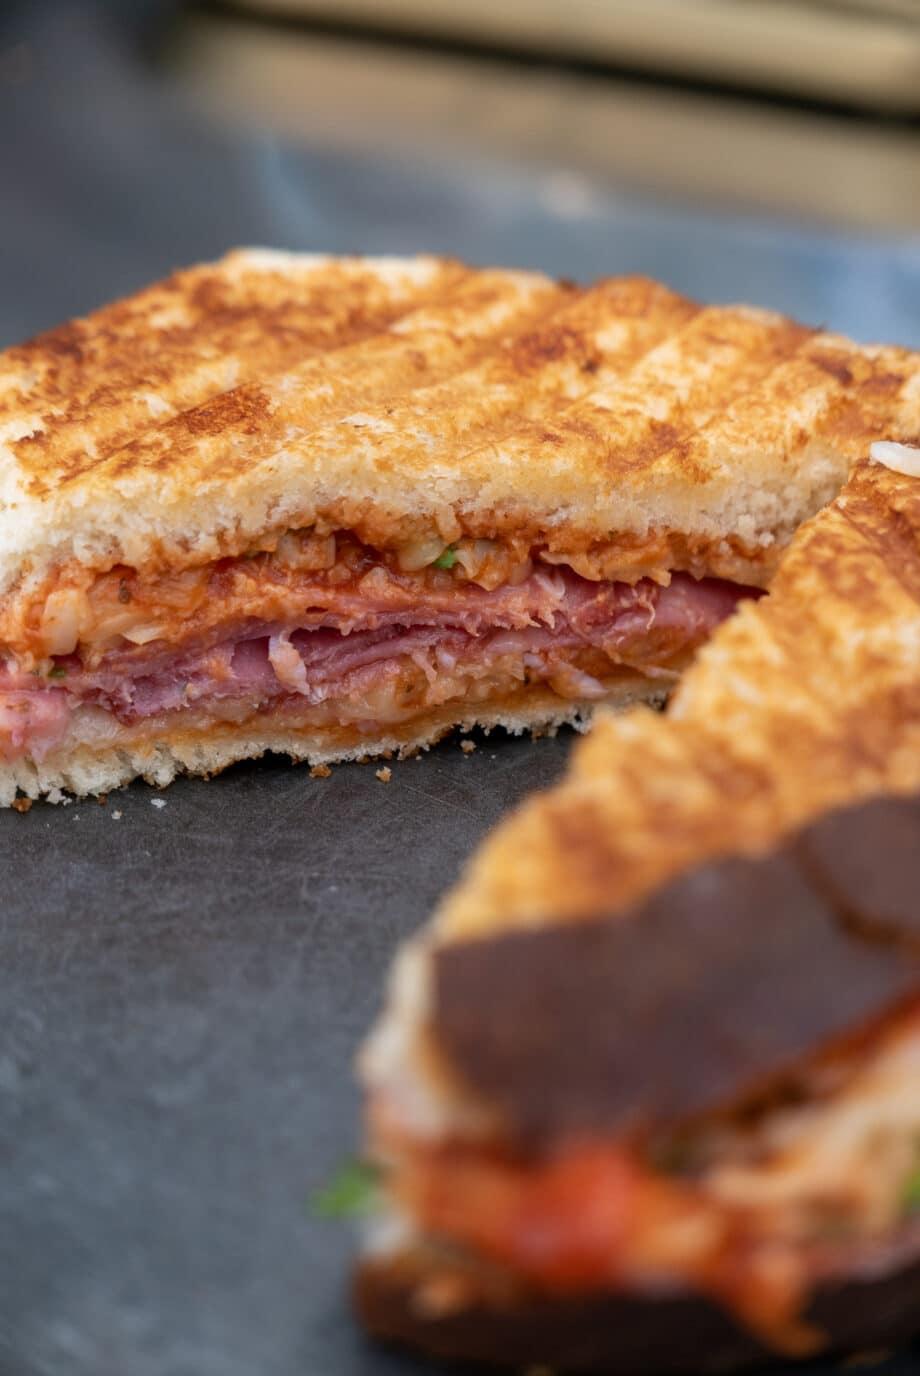 margarita-sandwich-panitier-01